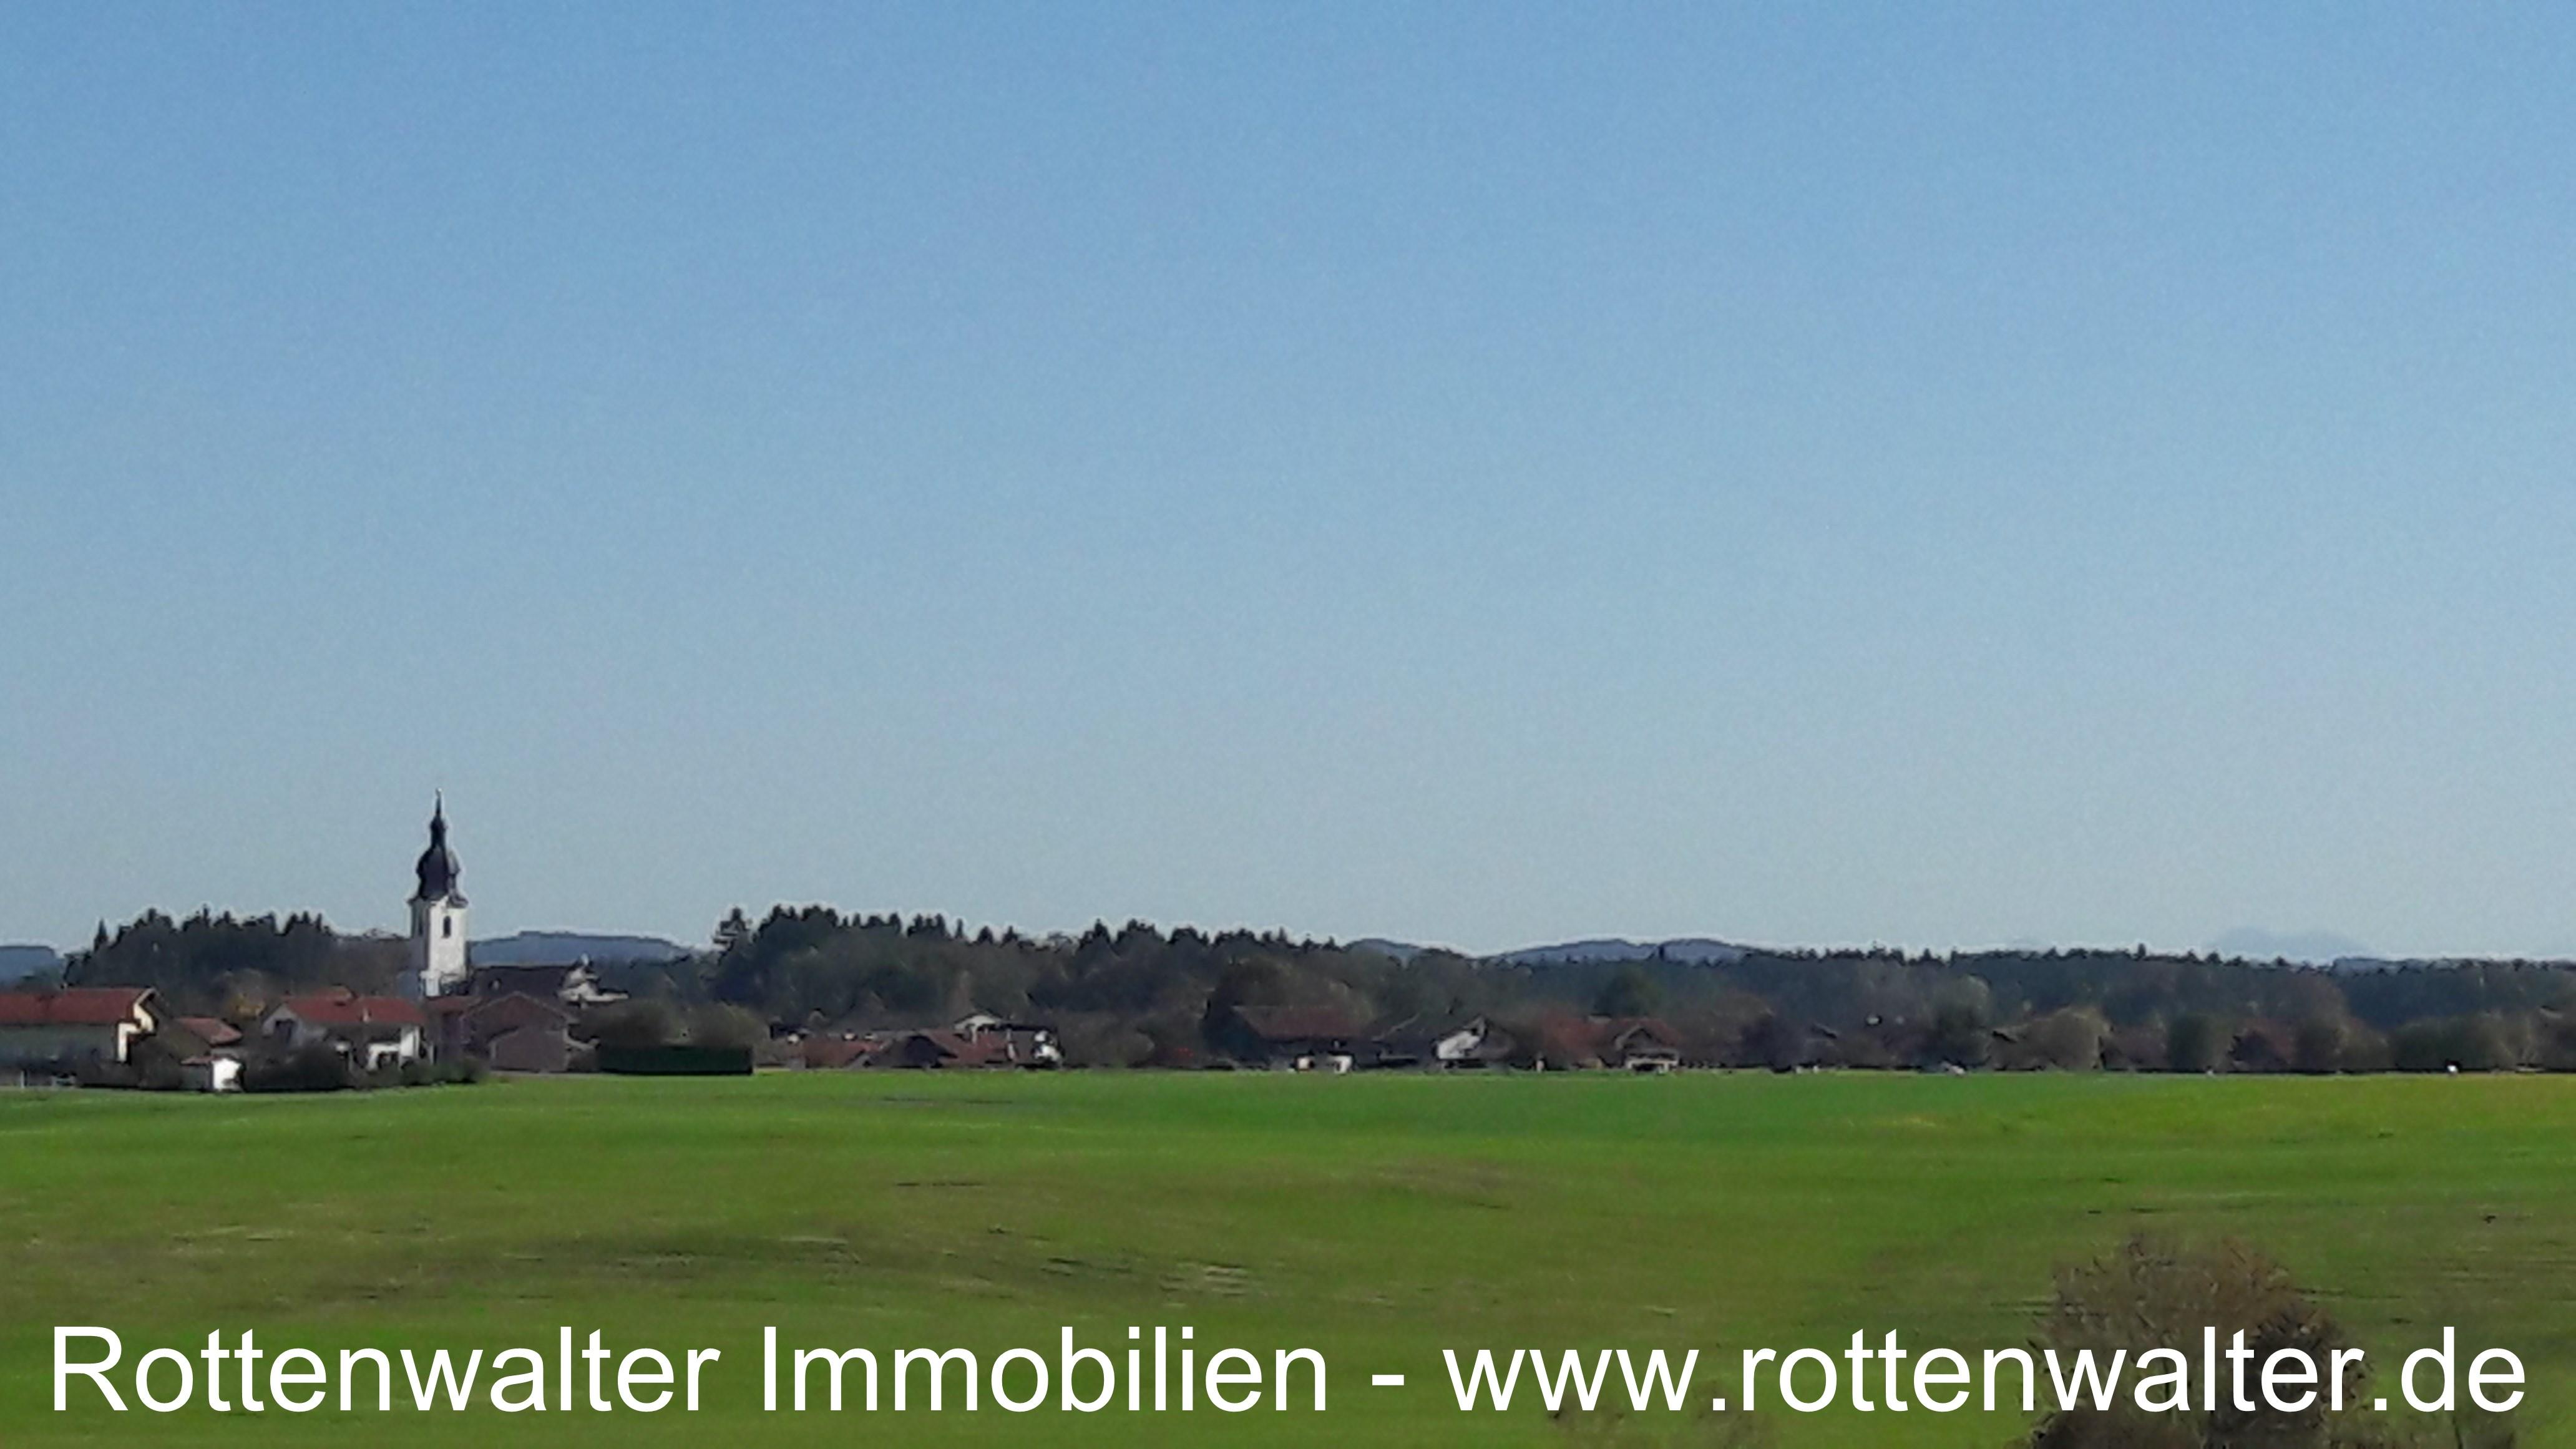 Rottenwalter Immobilien - Immobilienmakler Eiselfing